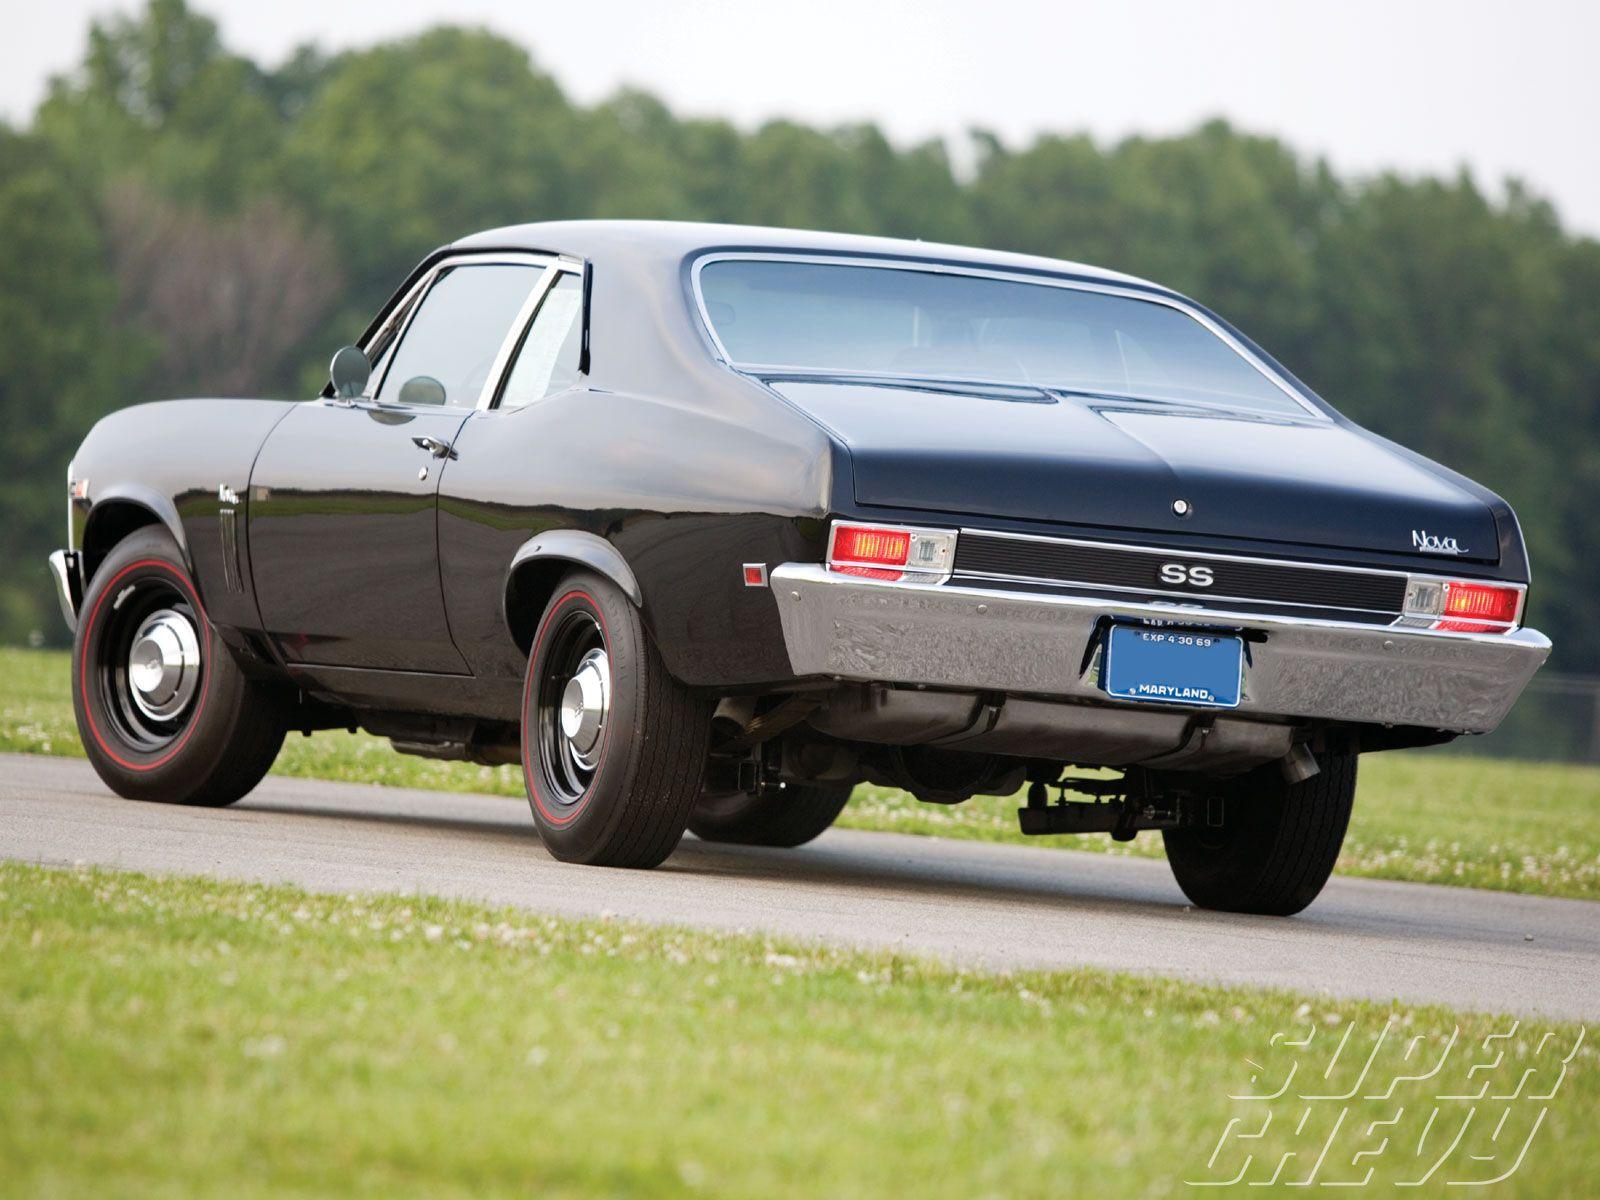 1969 nova ss 1969 chevy nova ss left rear angle